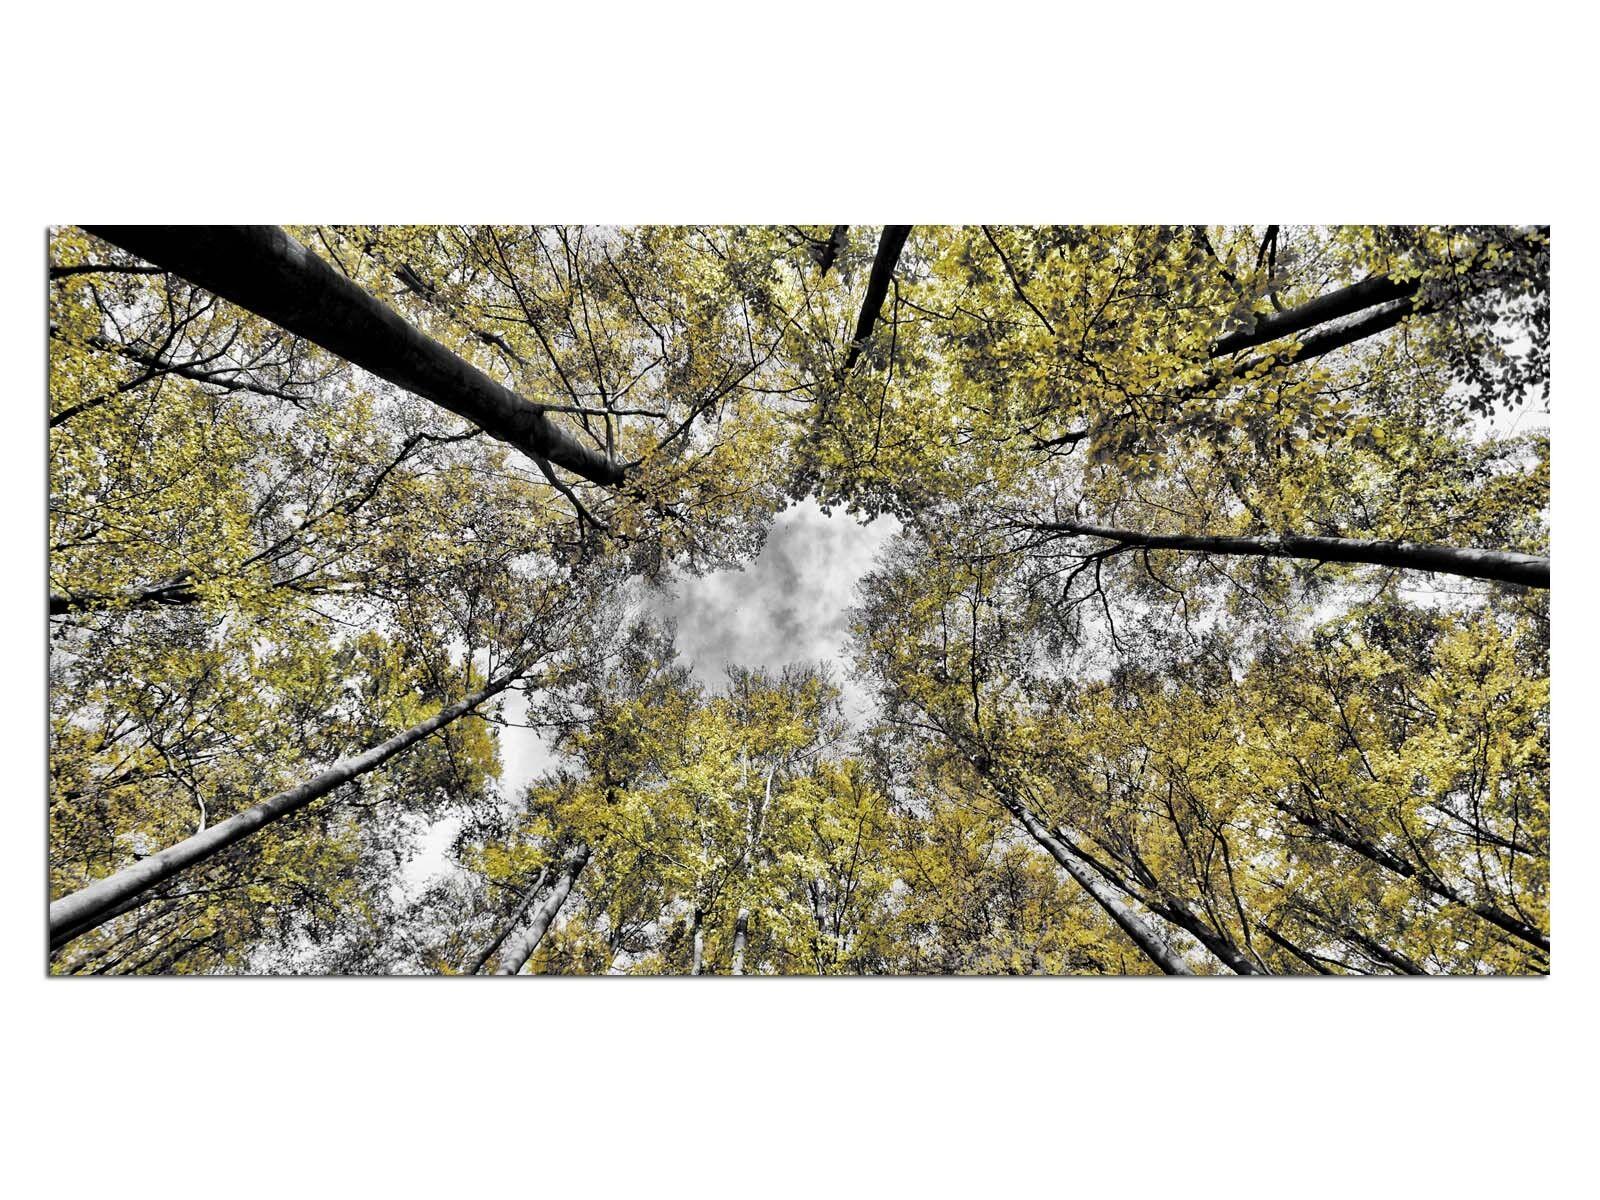 Deco De Vidrio Imagen eg4100500713 abedul árboles forestales verde Tamaño 39,37  X 19,68  Hd